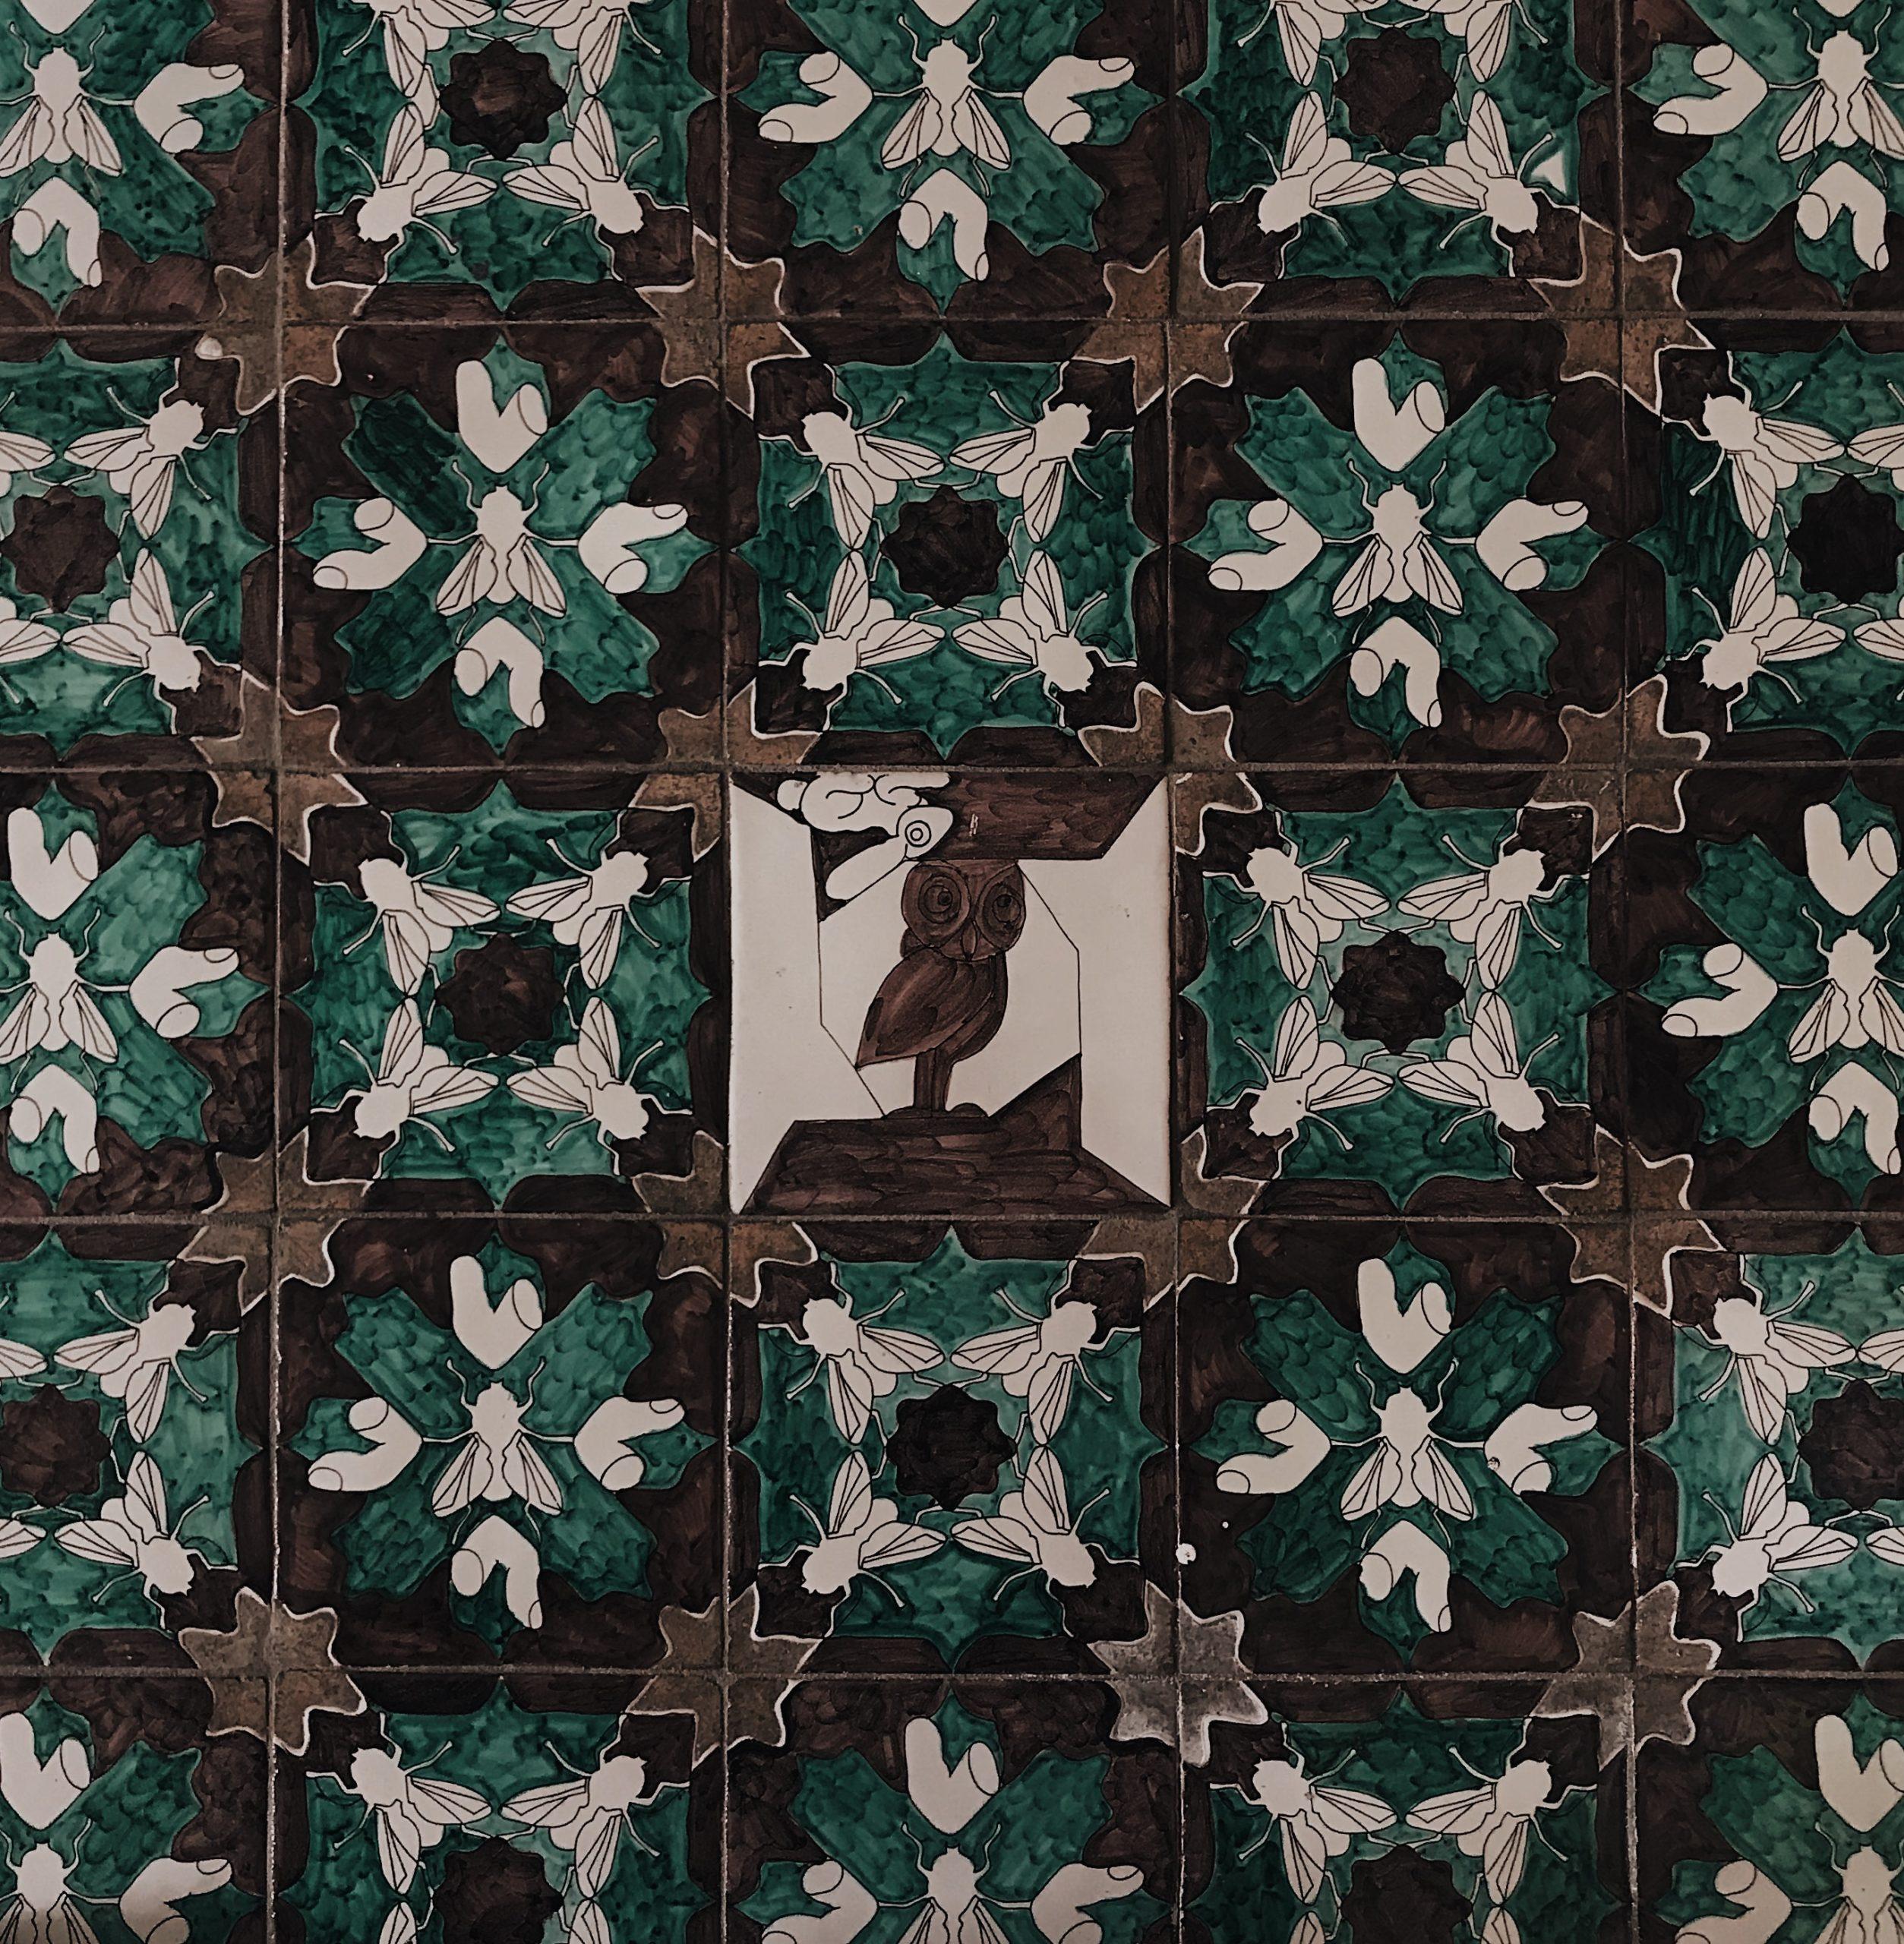 Mosaïque - Musée d'Art contemporain Donnaregina